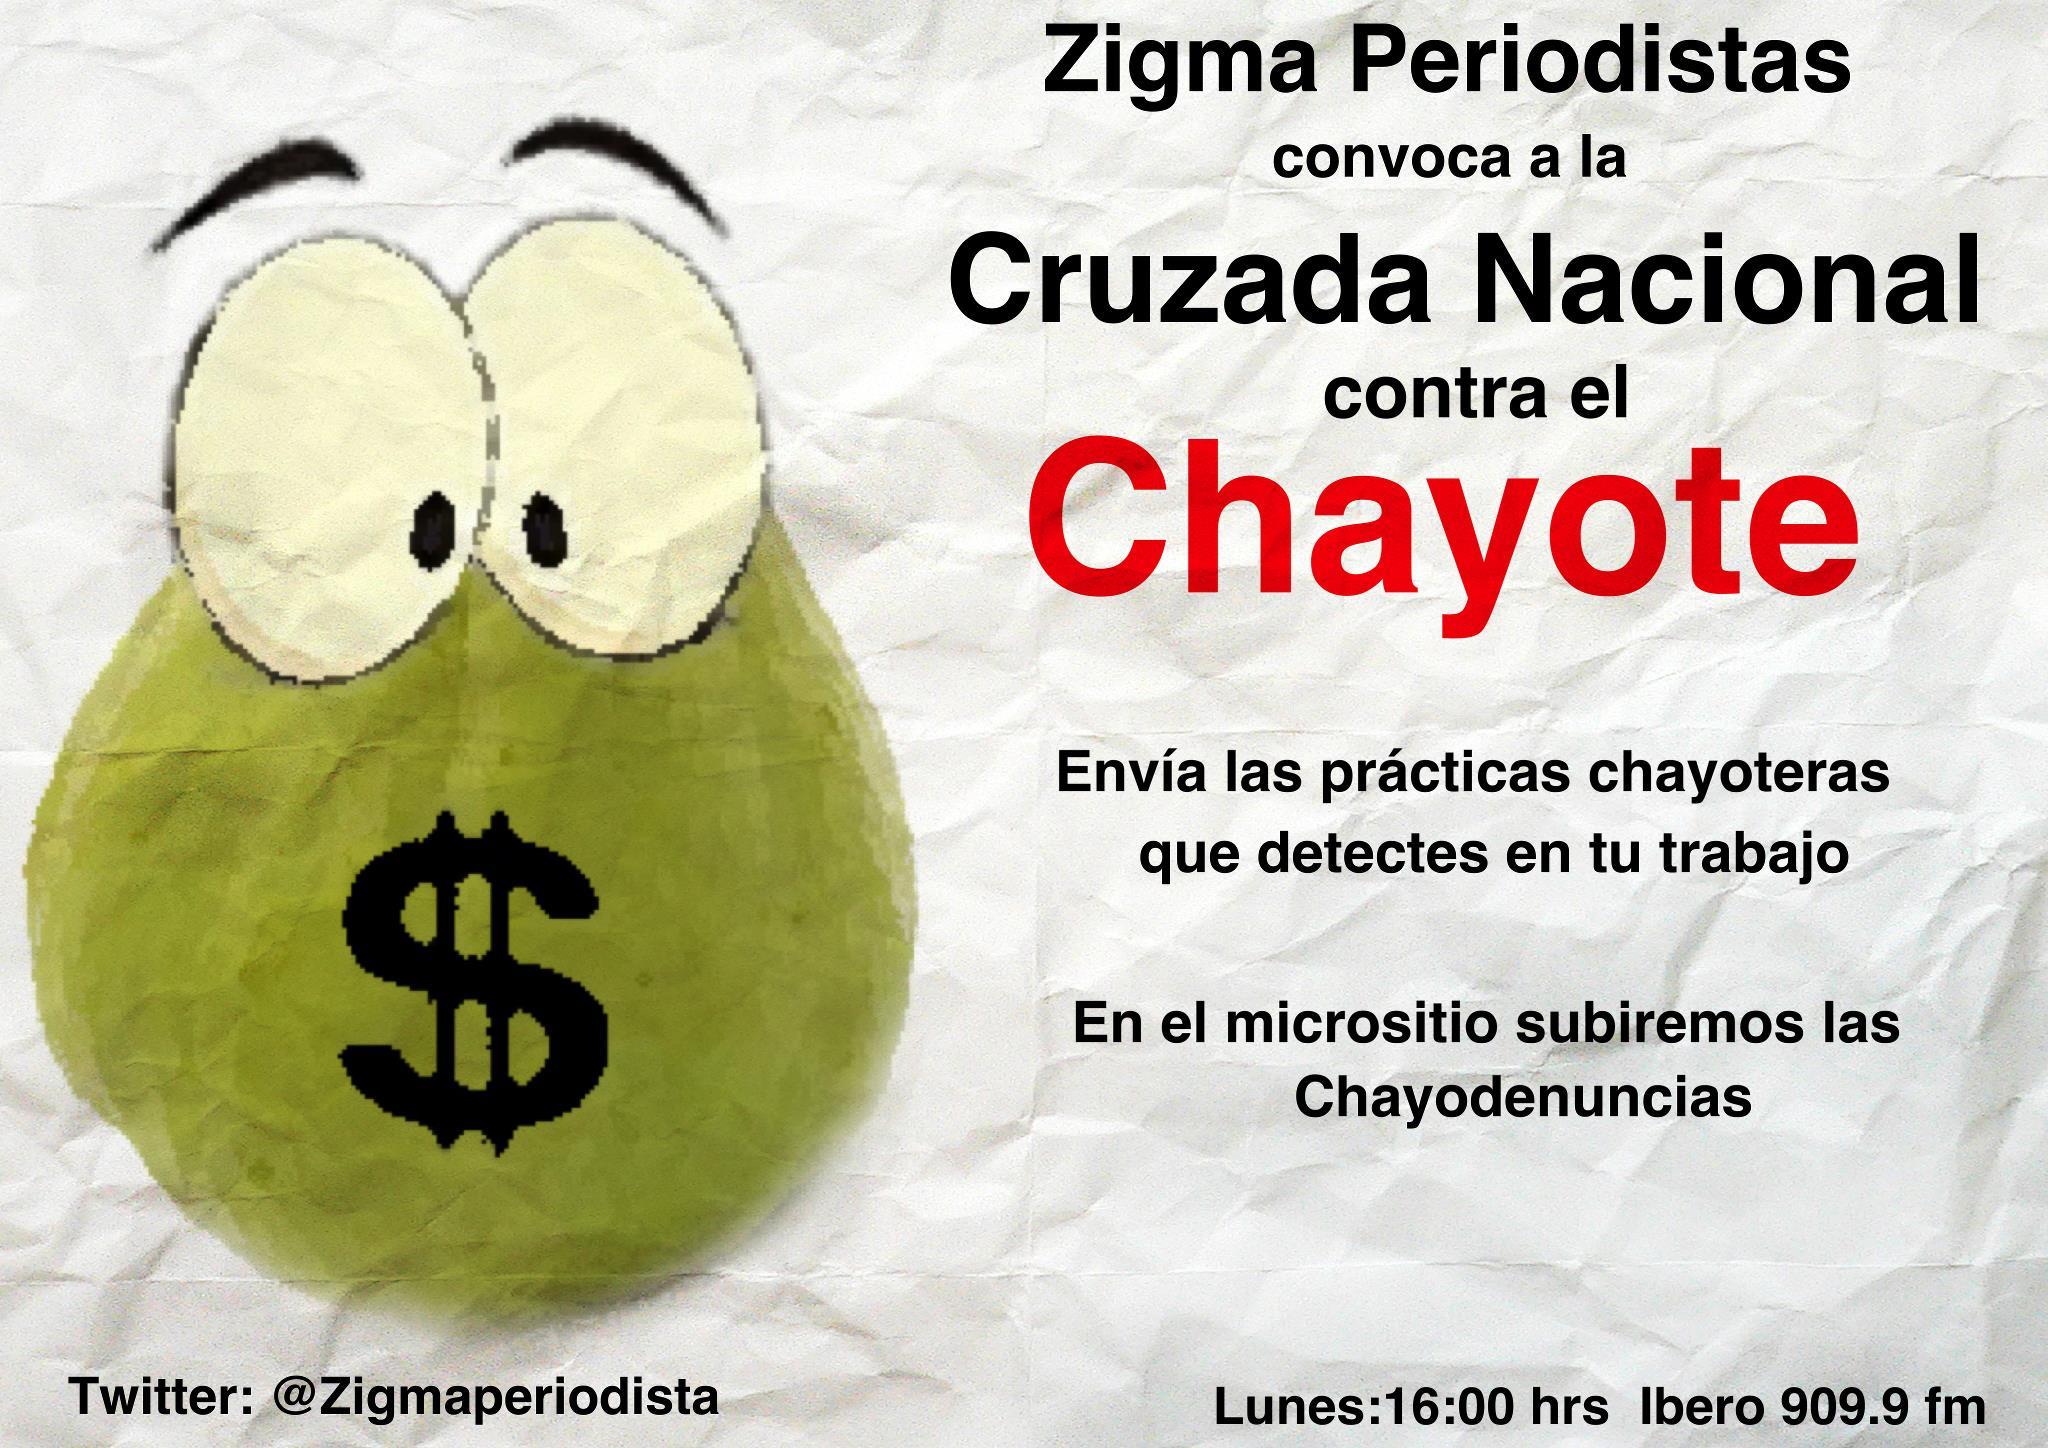 Zigma Periodista